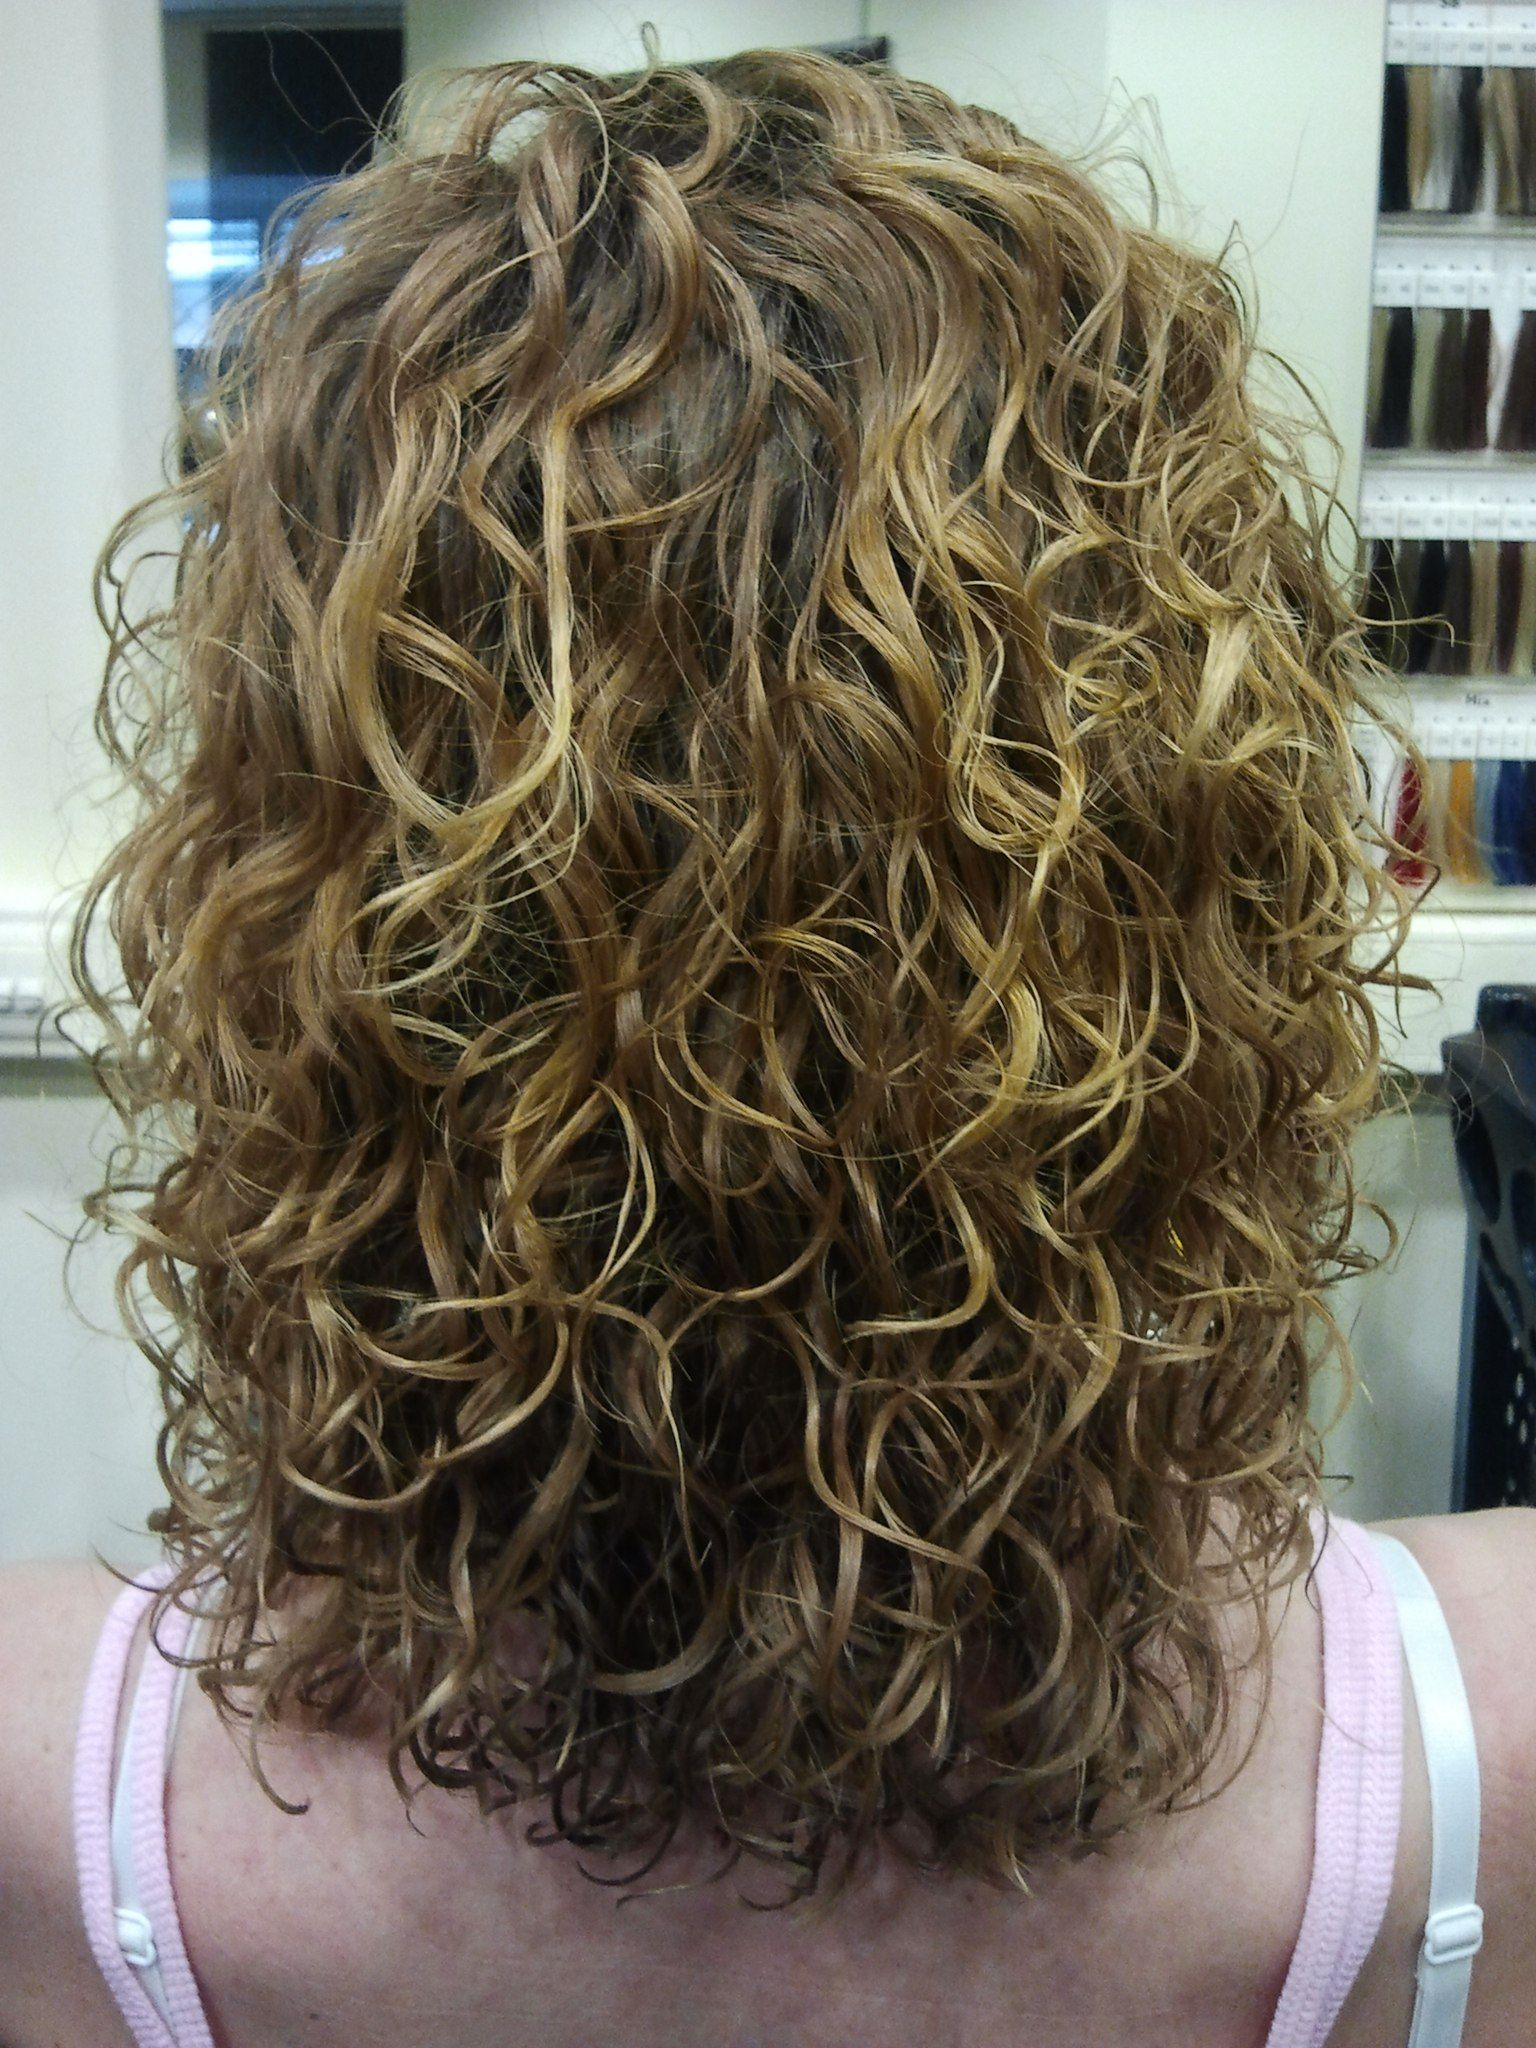 Big Curls Highlights Medium Length Hairstyles